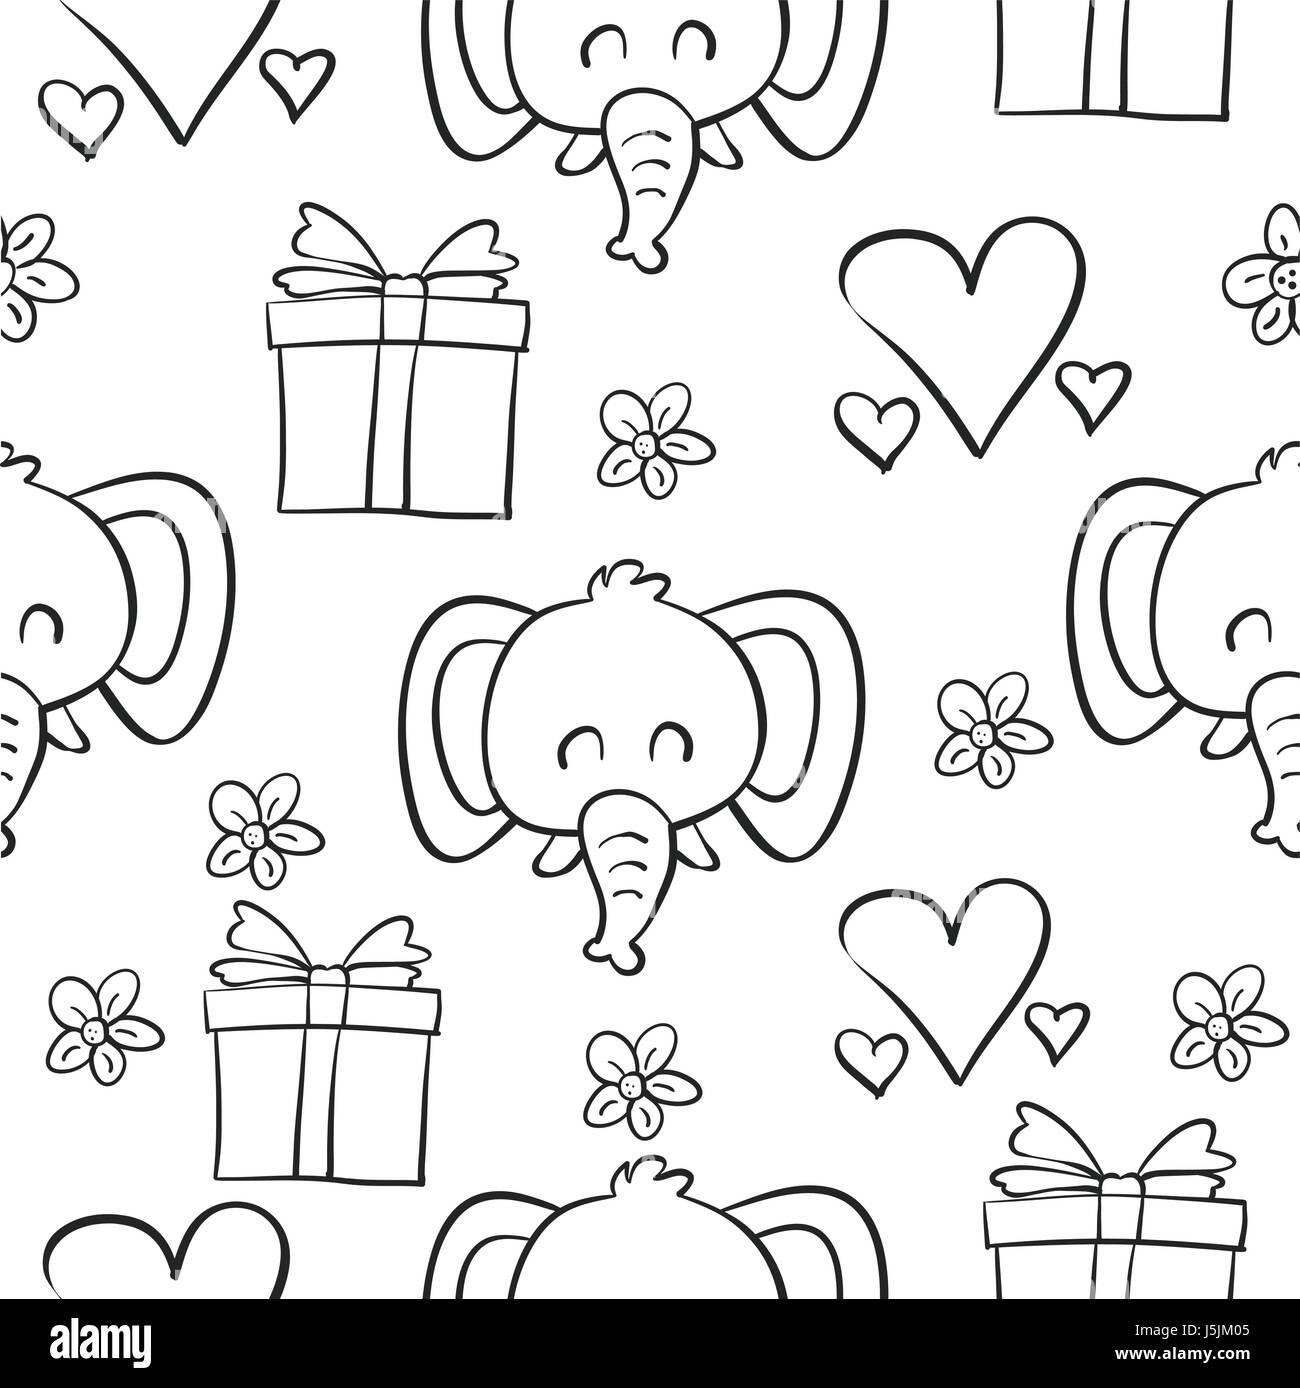 circus elephant black and white stock photos u0026 images alamy